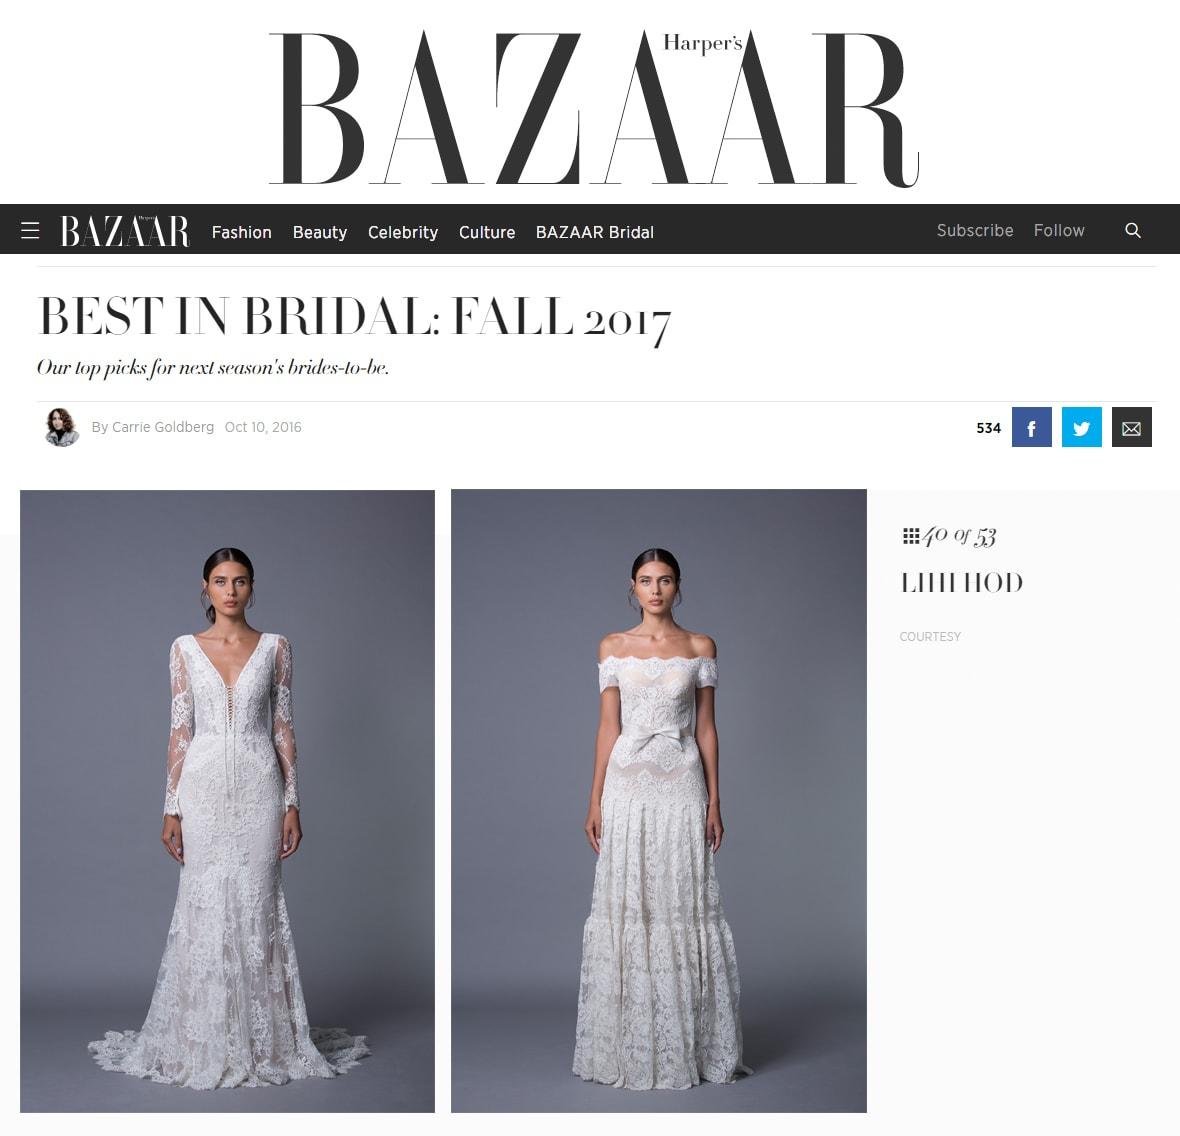 Best in Bridal: Fall 2017